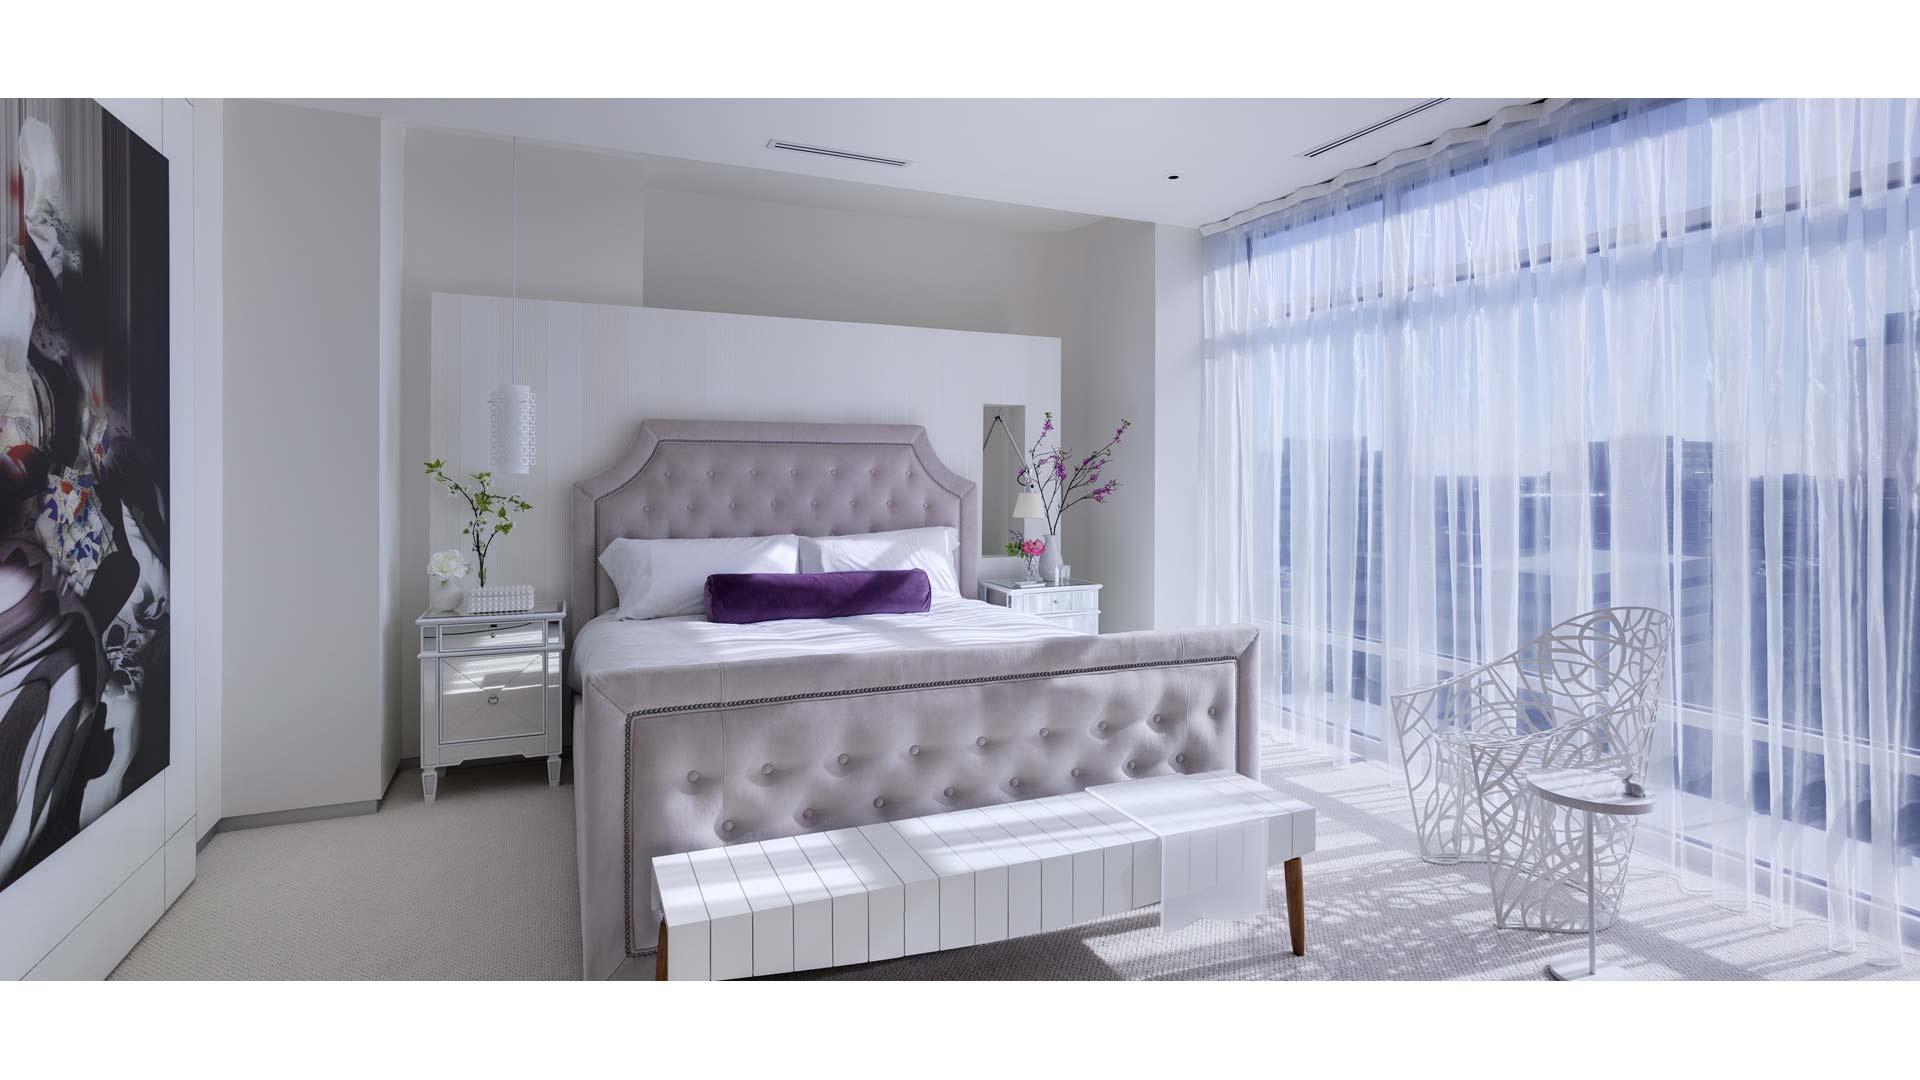 Adagio Penthouse Interior - Master Bedroom Daylight - HAUS Architecture, Christopher Short, Indianapolis Architect